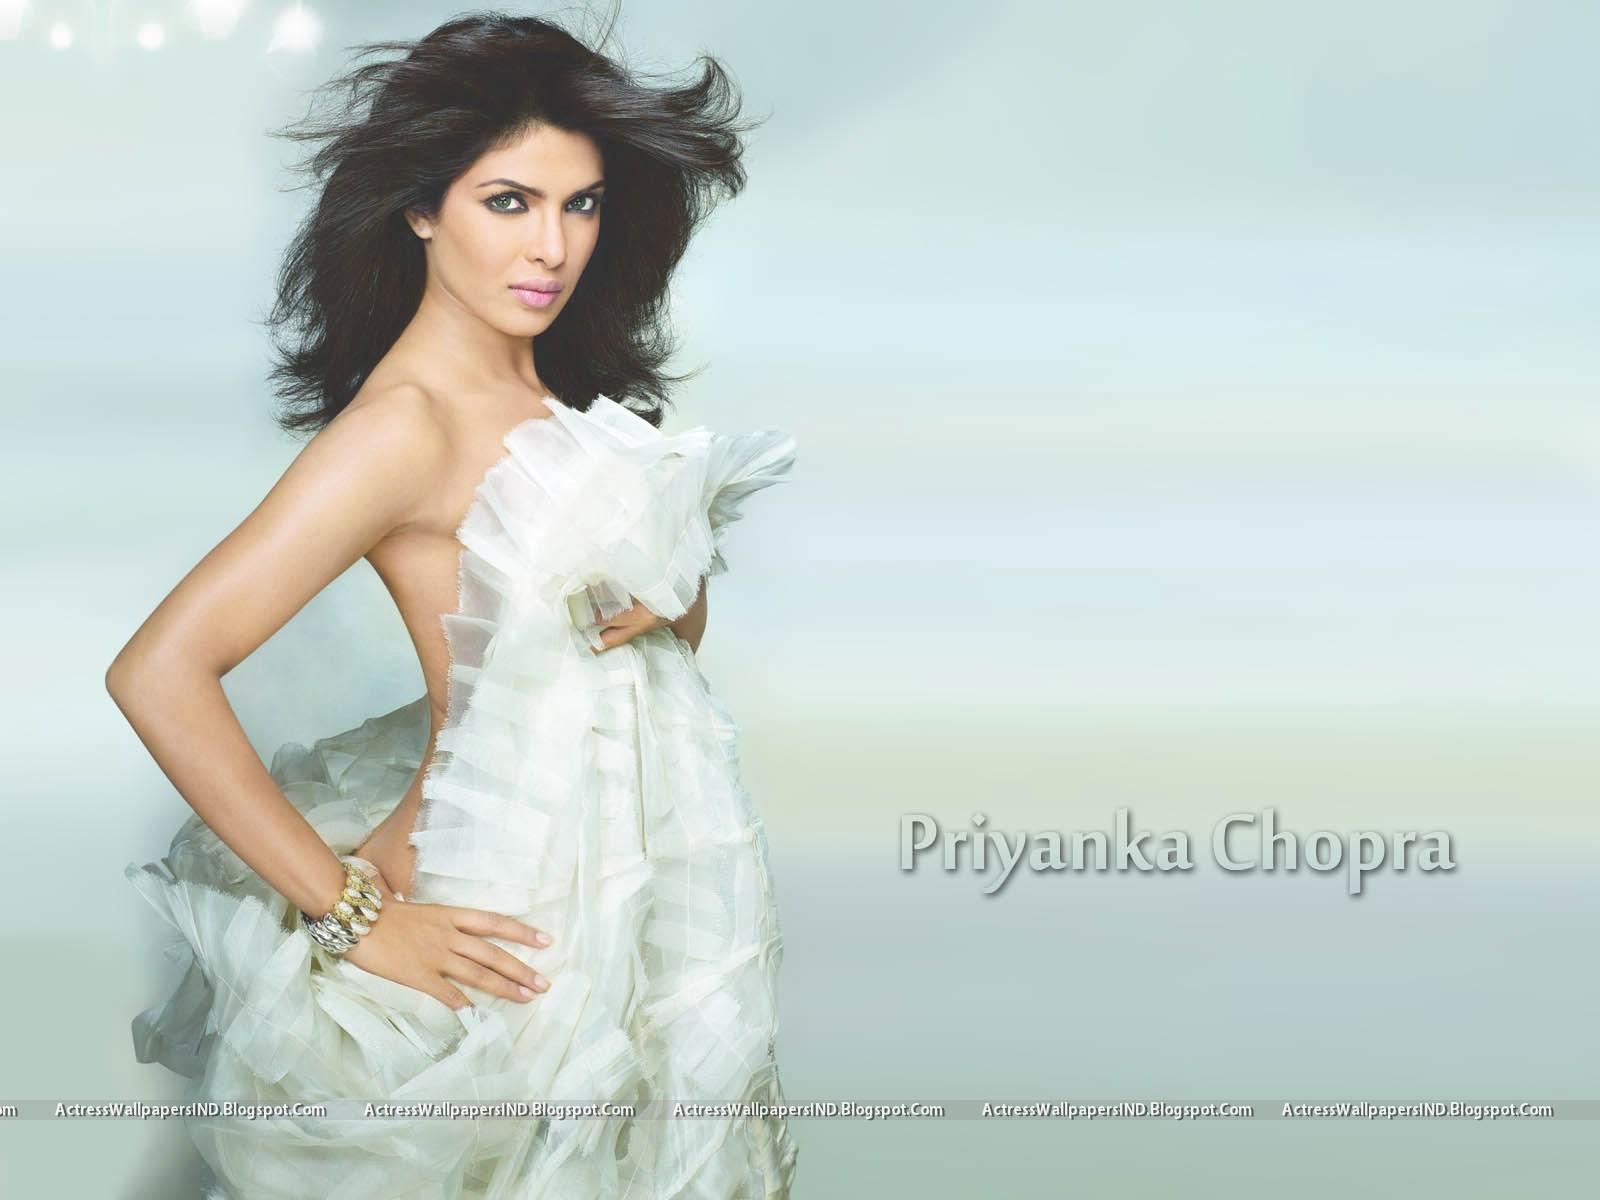 Priyanka Chopra Very Hot Photos - A Wind-1572